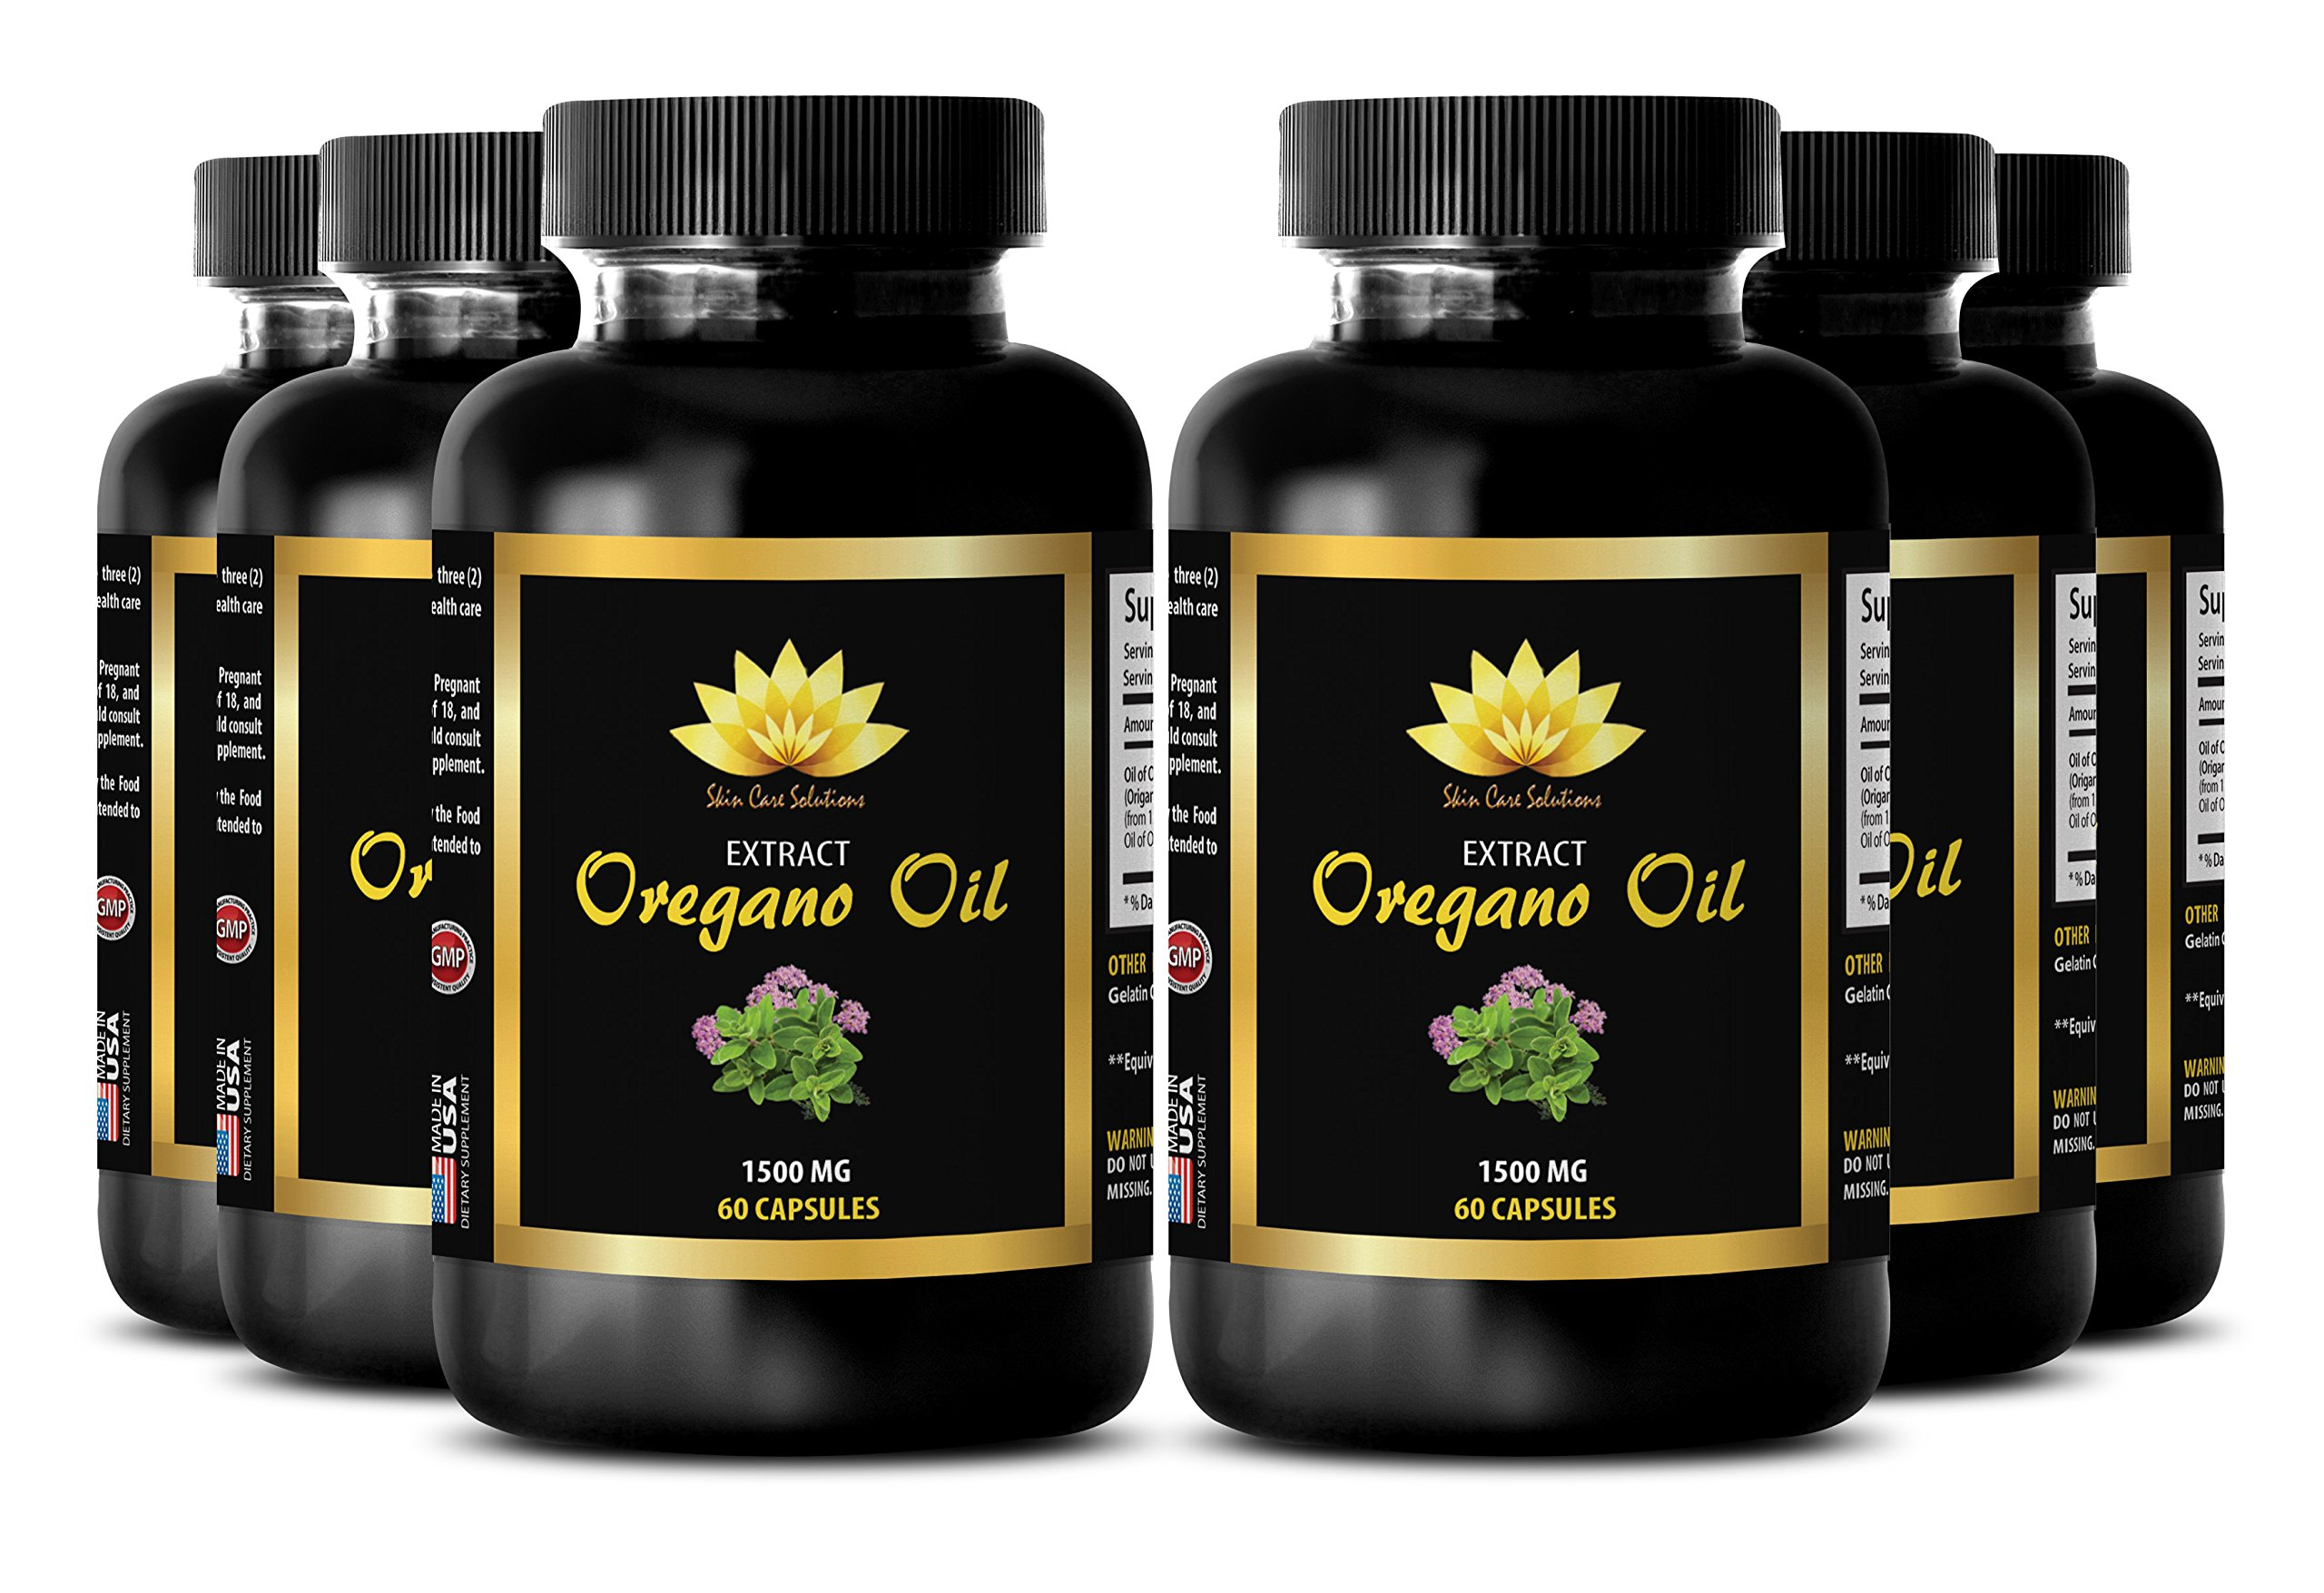 Anti fungal supplements - OREGANO OIL EXTRACT 1500mg - Oregano vulgares oil - 6 Bottles 360 Capsules